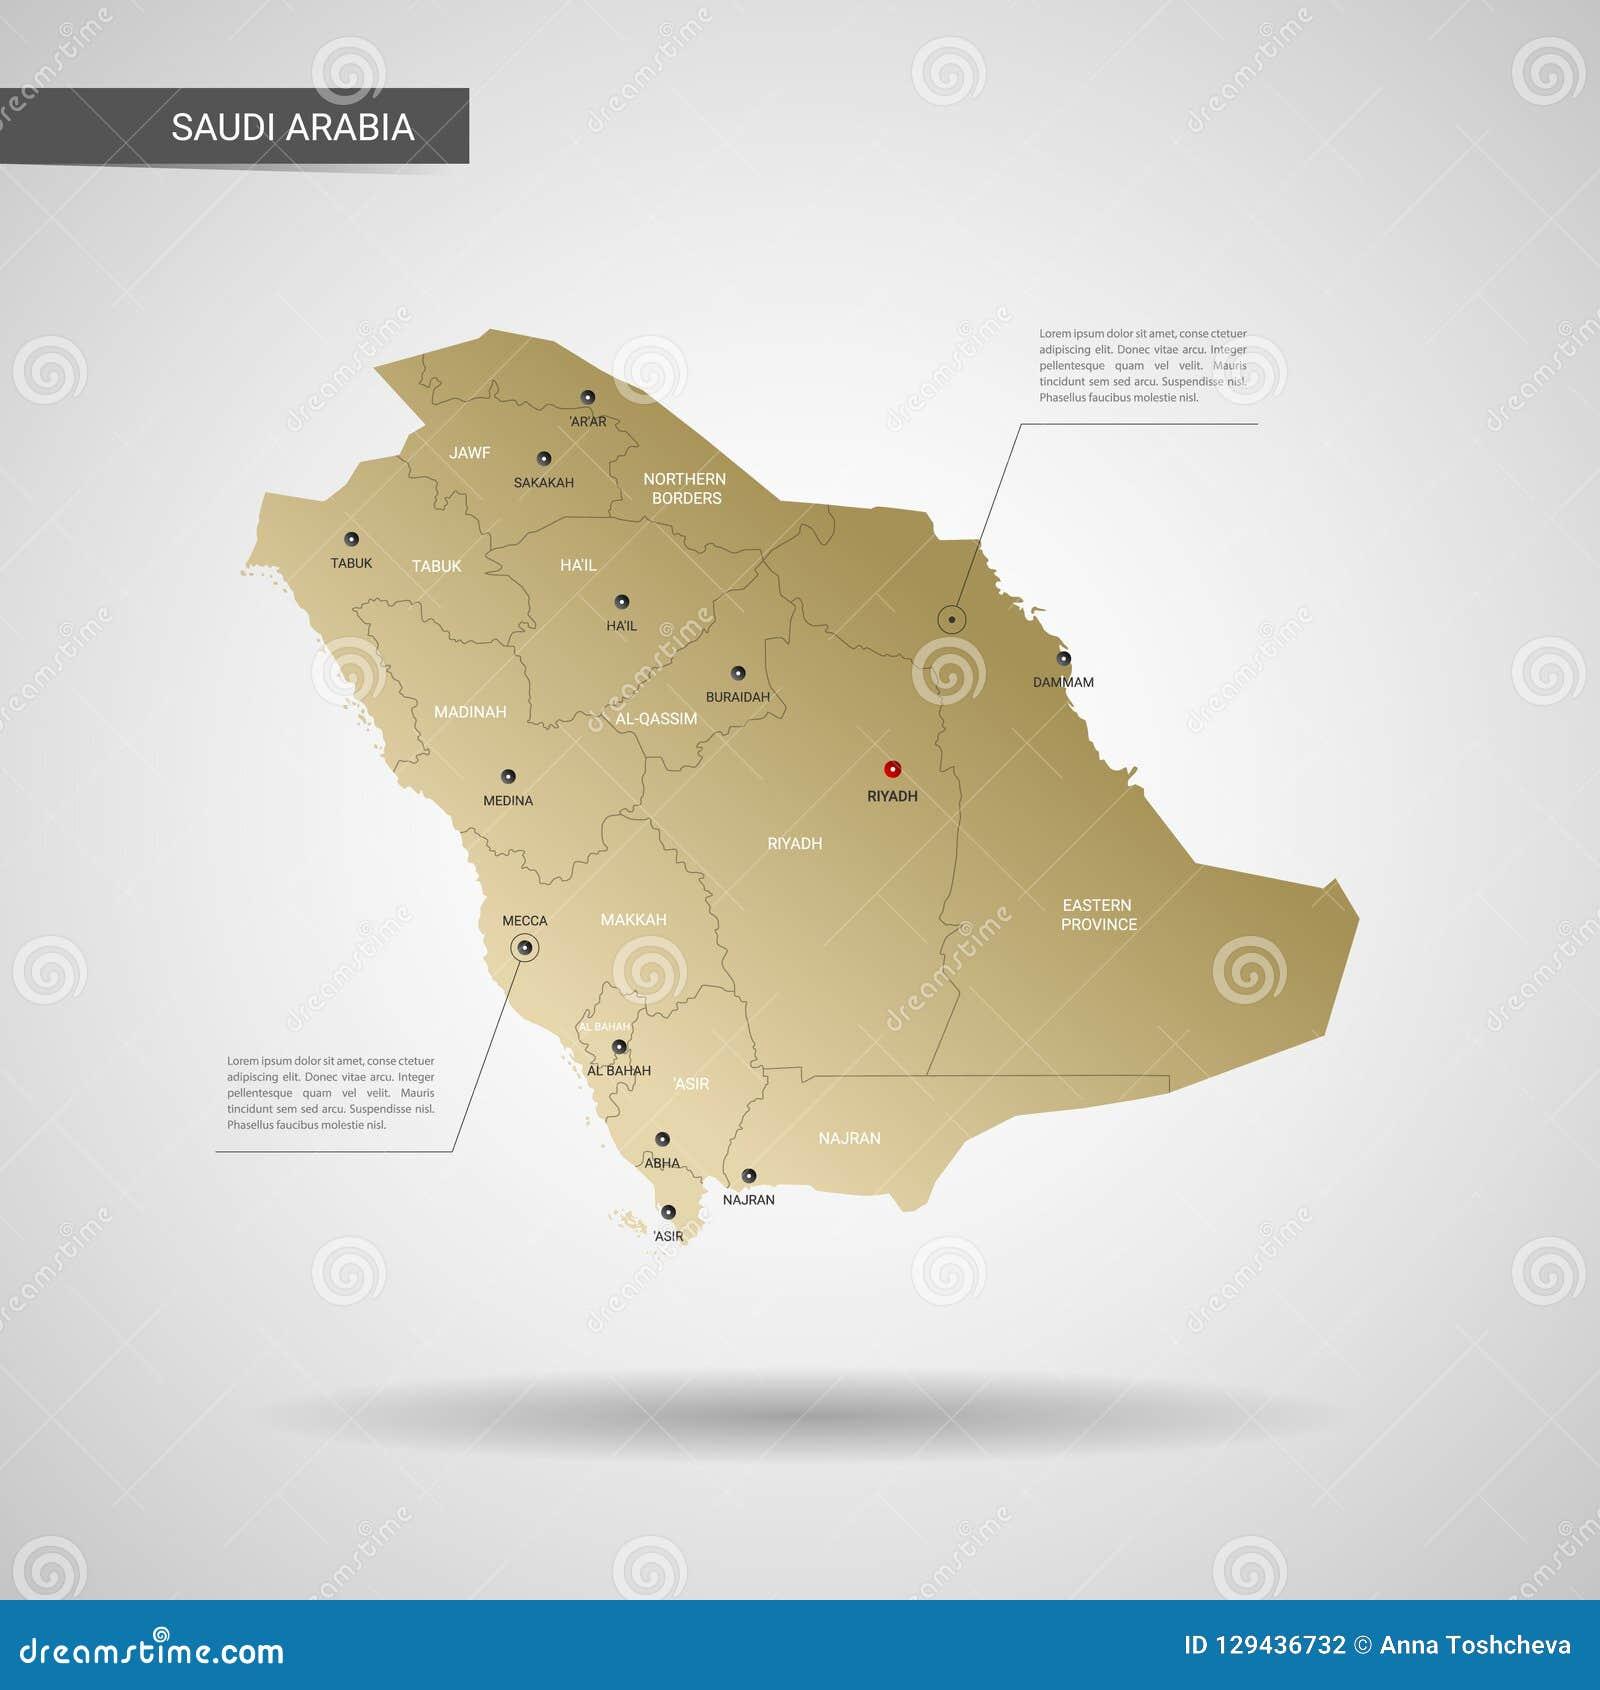 Stylized Saudi Arabia Map Vector Illustration. Stock Vector ...